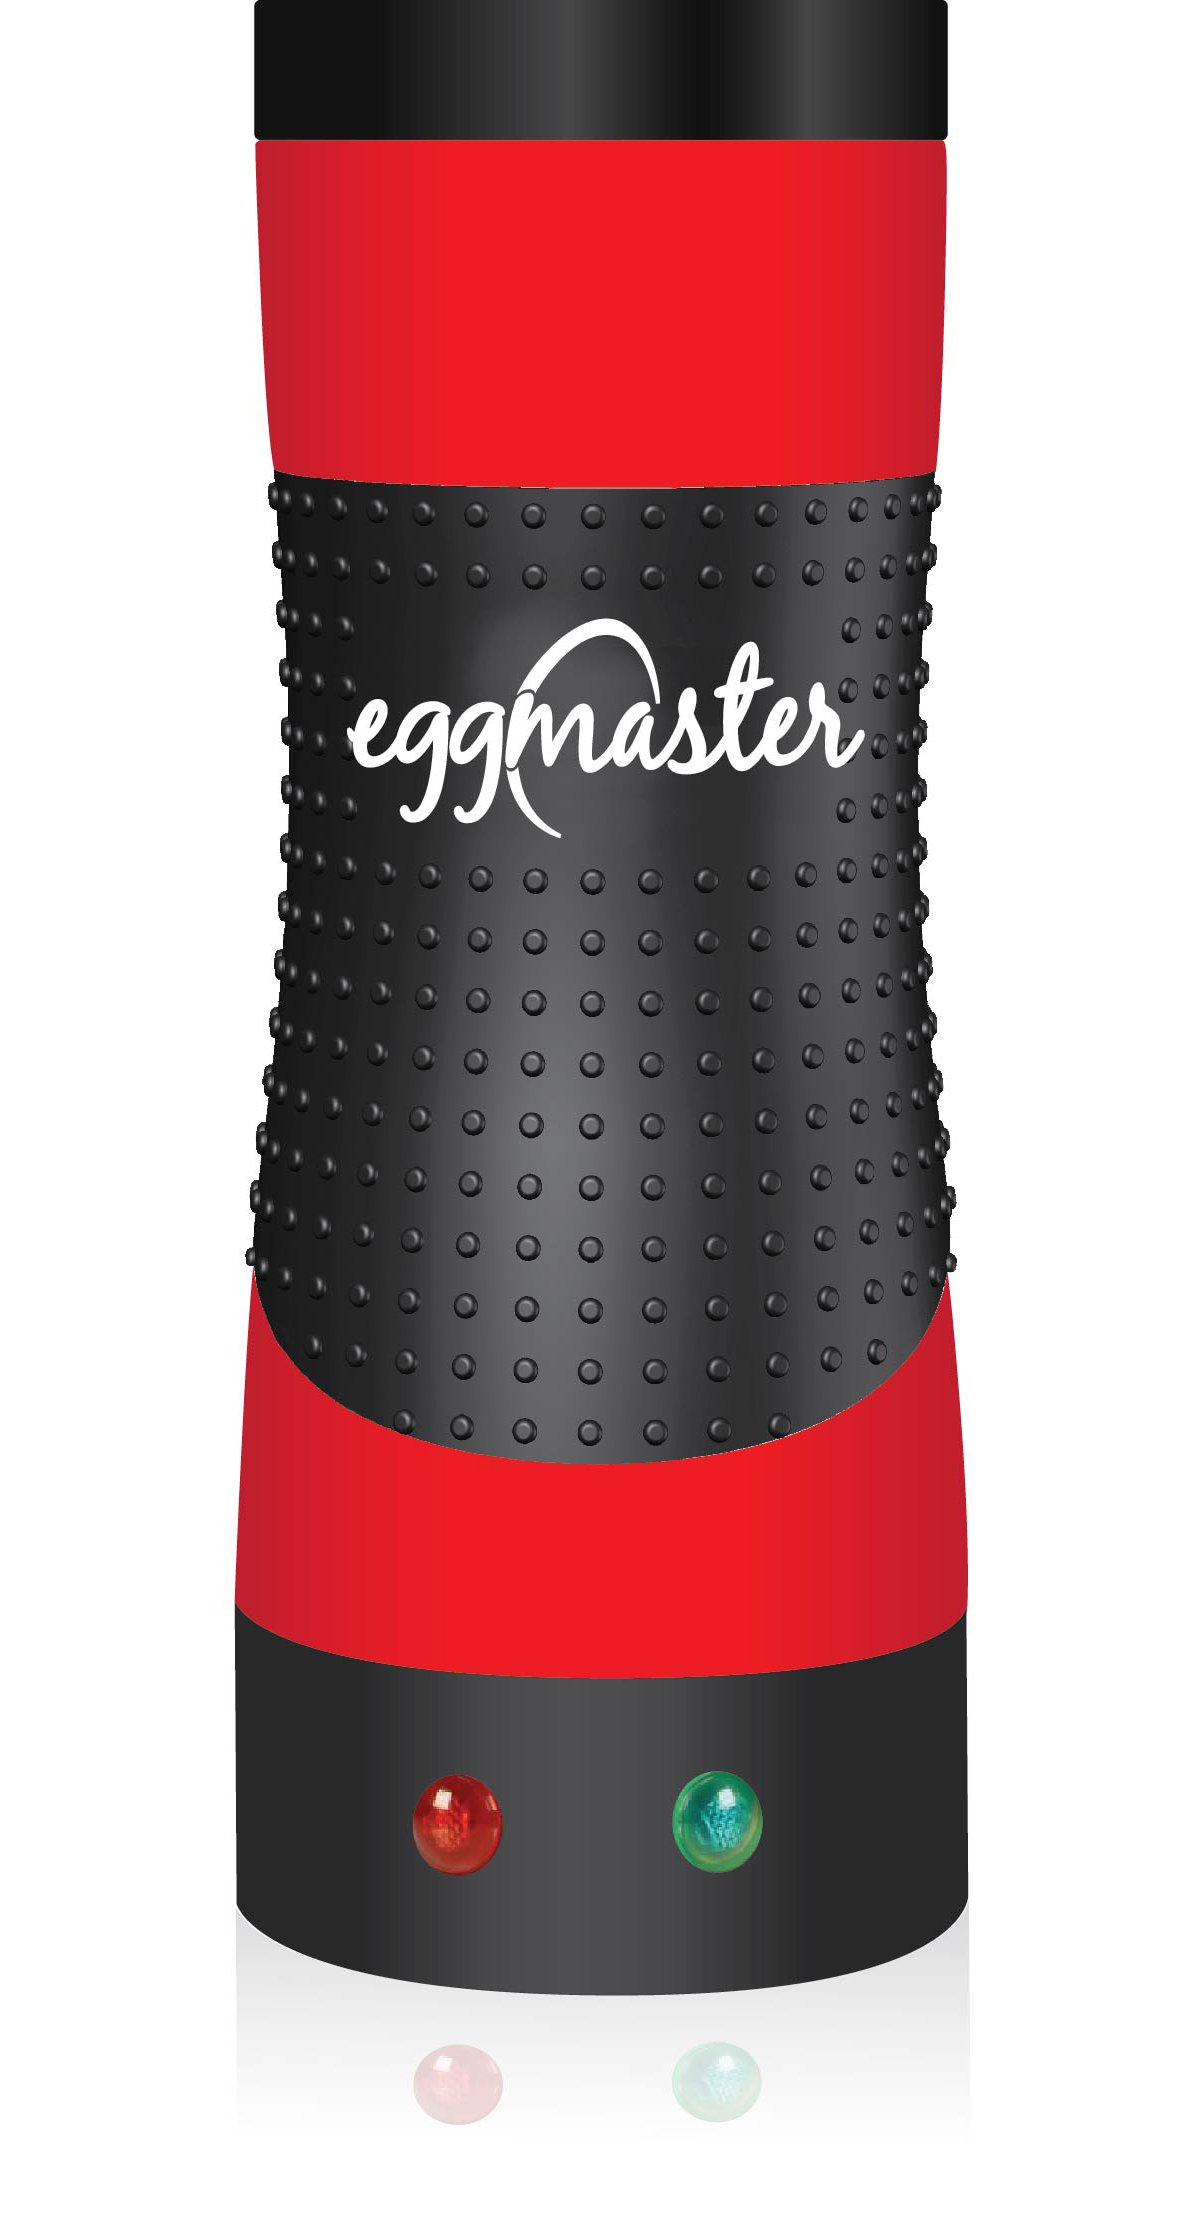 Eggmaster, Automatic Electric Egg Cooker, Egg maker, Nonstick Easy Quick Egg Cooker by Eggmaster